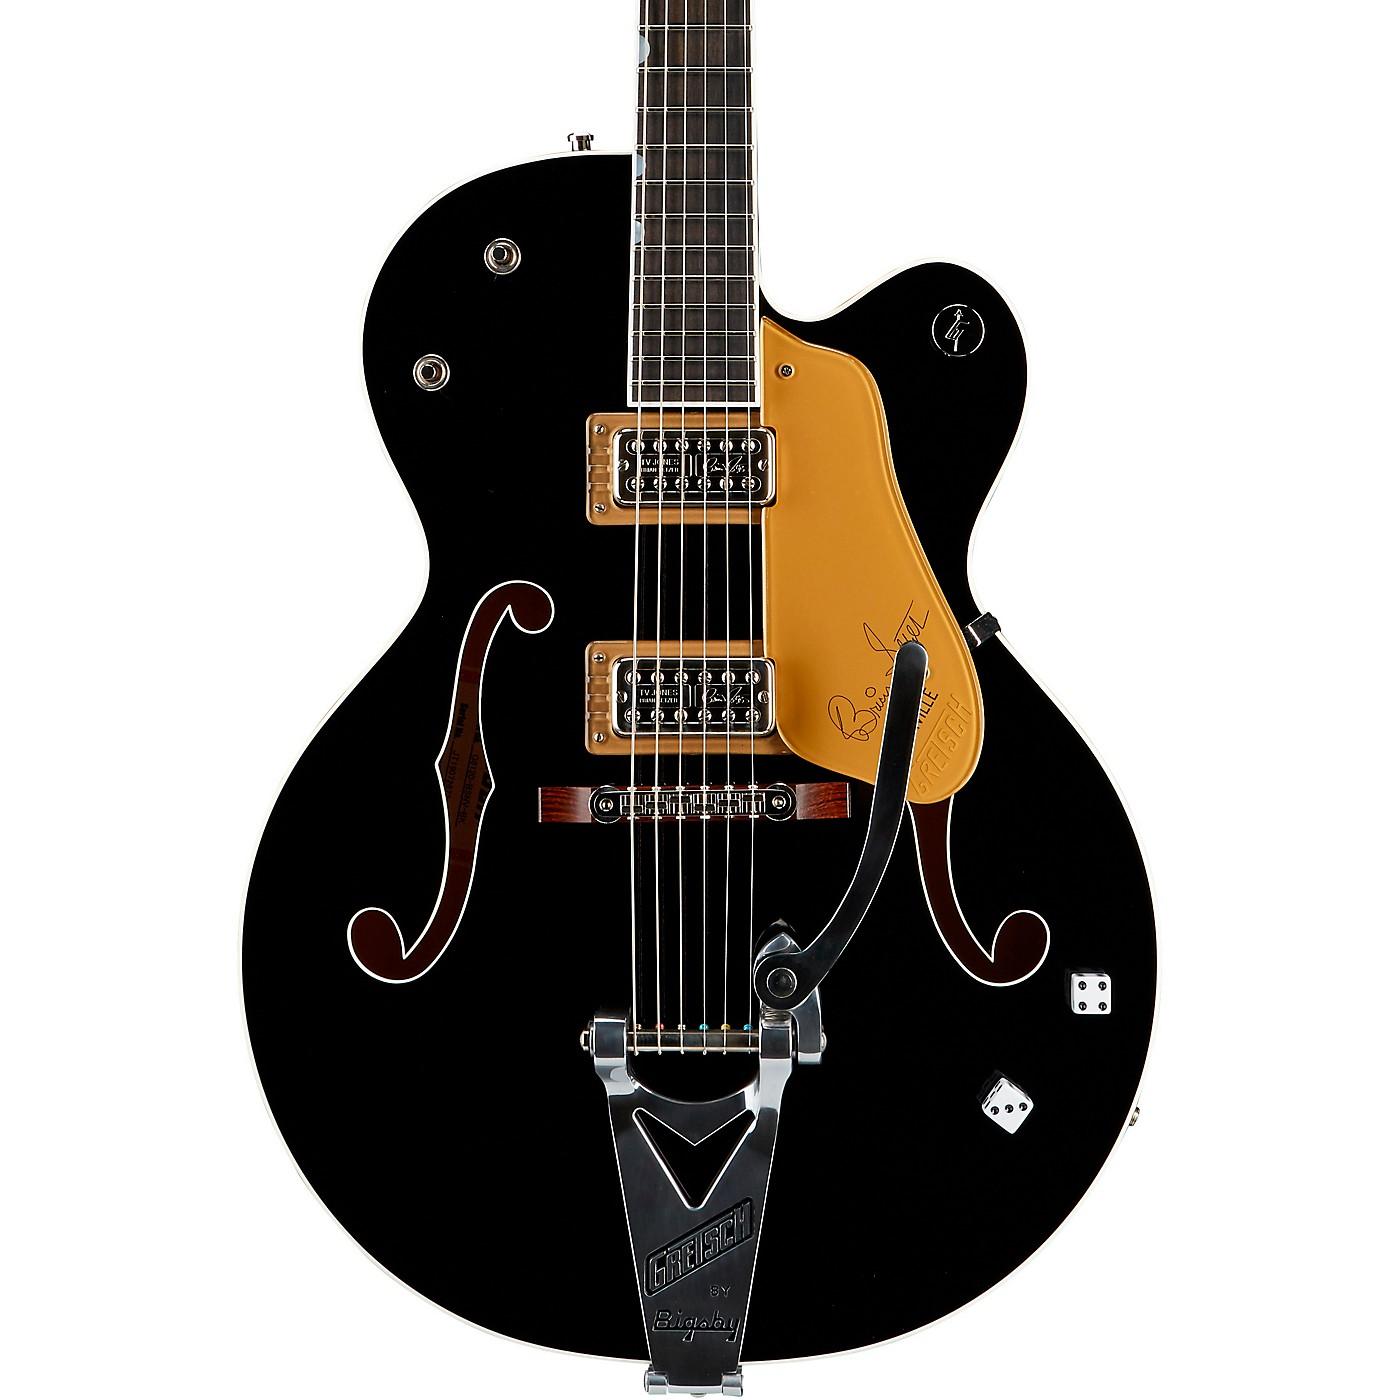 Gretsch Guitars G6120T-BSNSH Brian Setzer Signature Nashville Hollow Body with Bigsby thumbnail